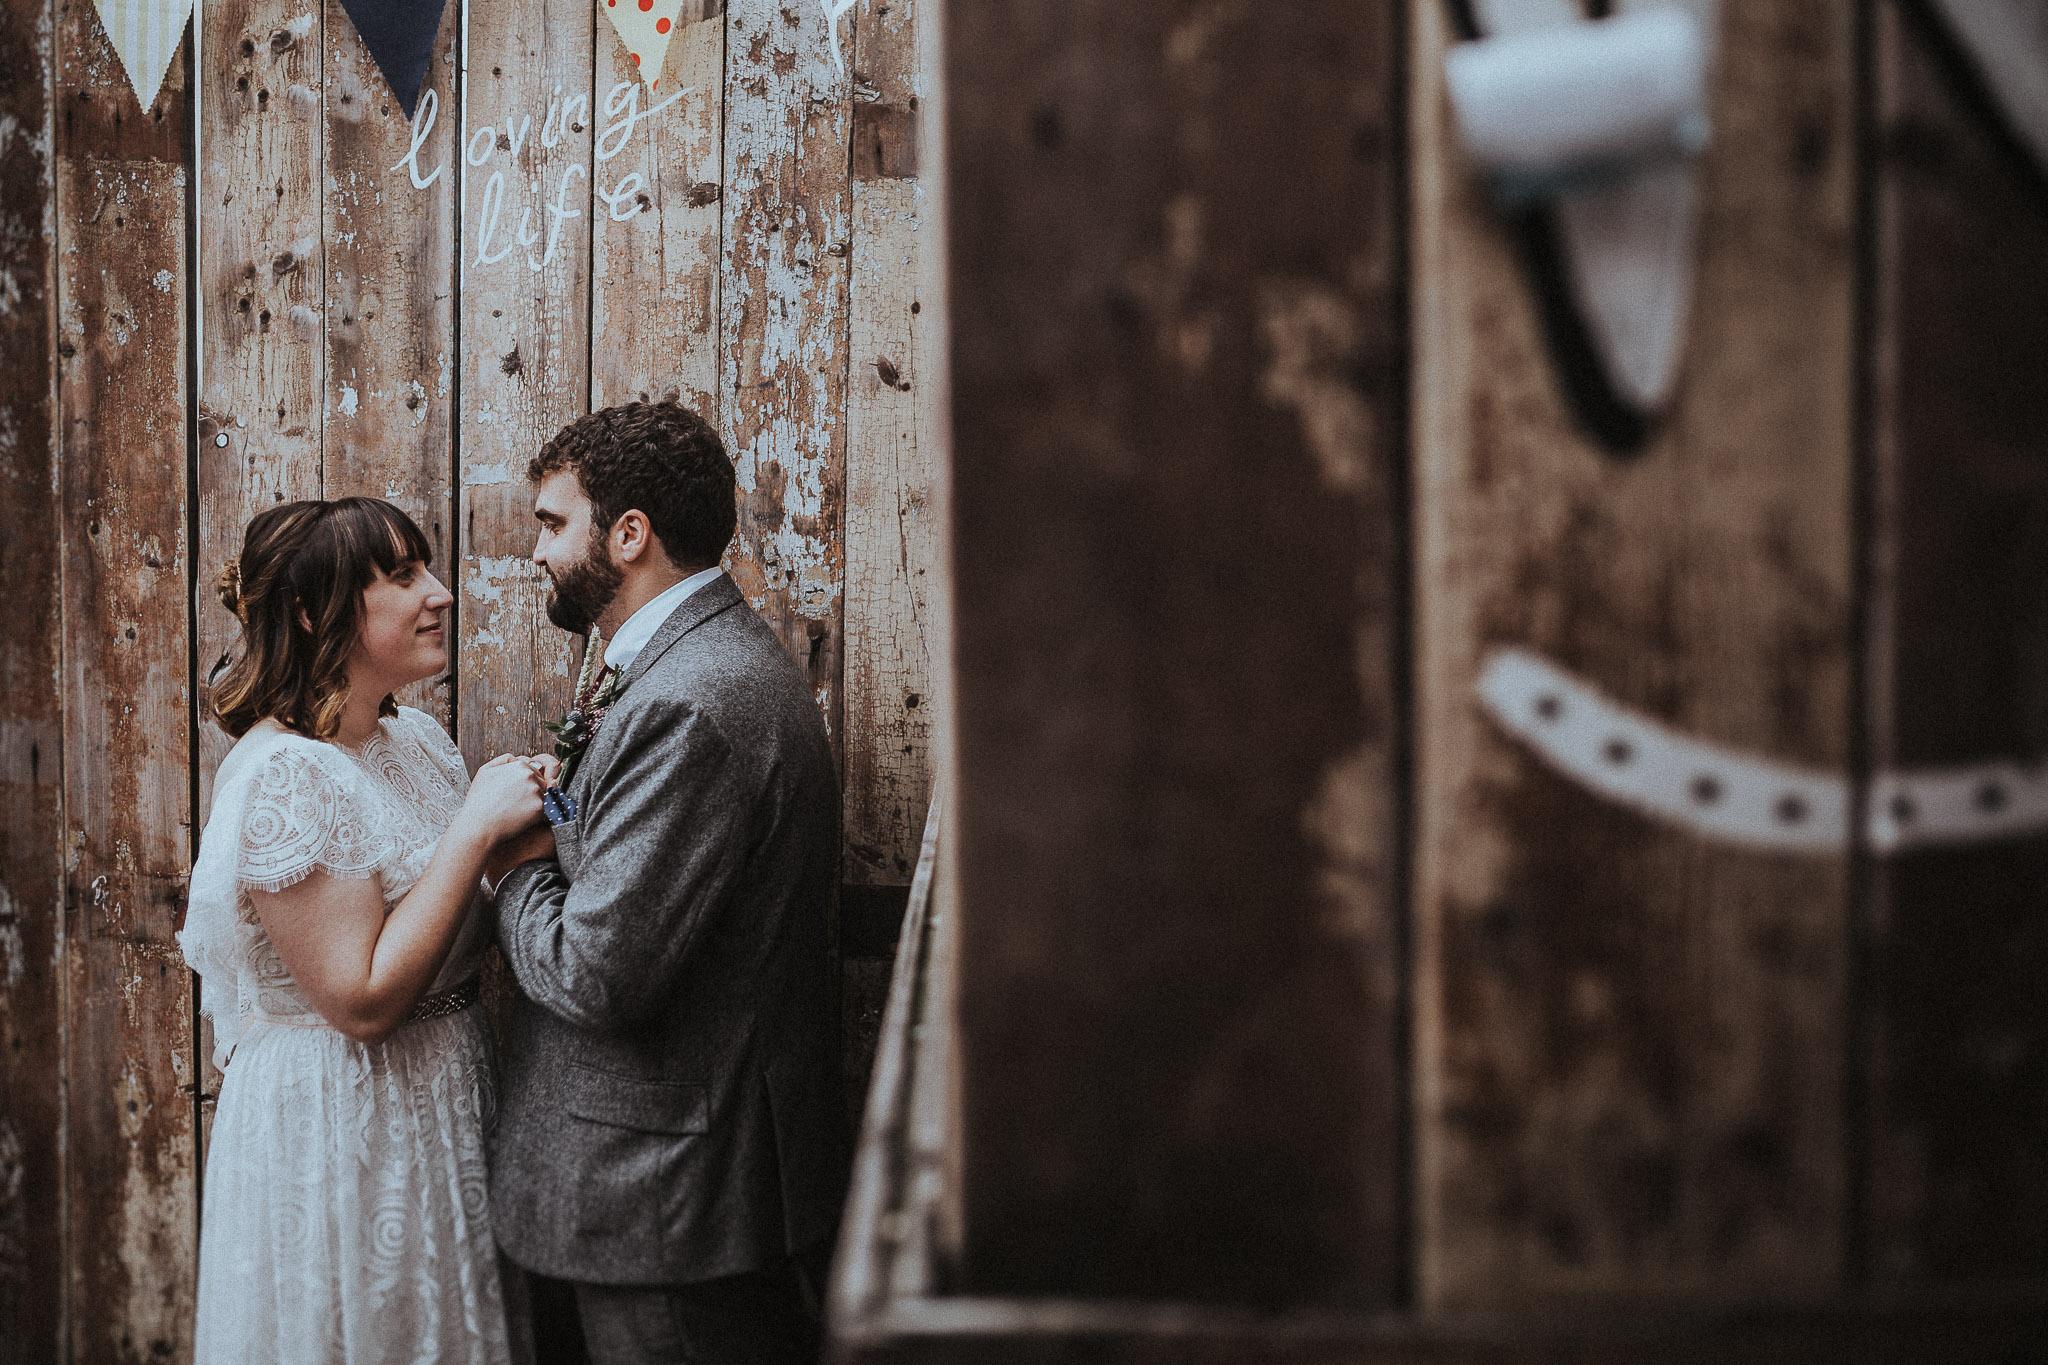 Manchester_Alternative_Wedding_Photographer-47.jpg